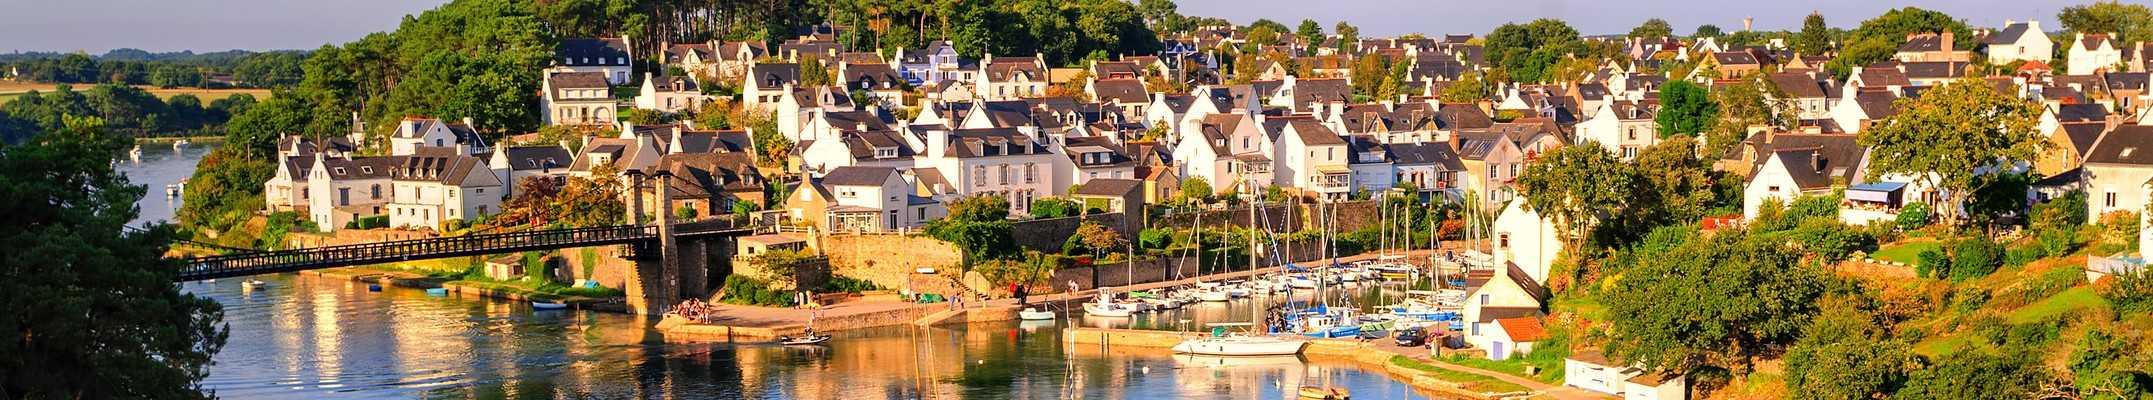 Morbihan image